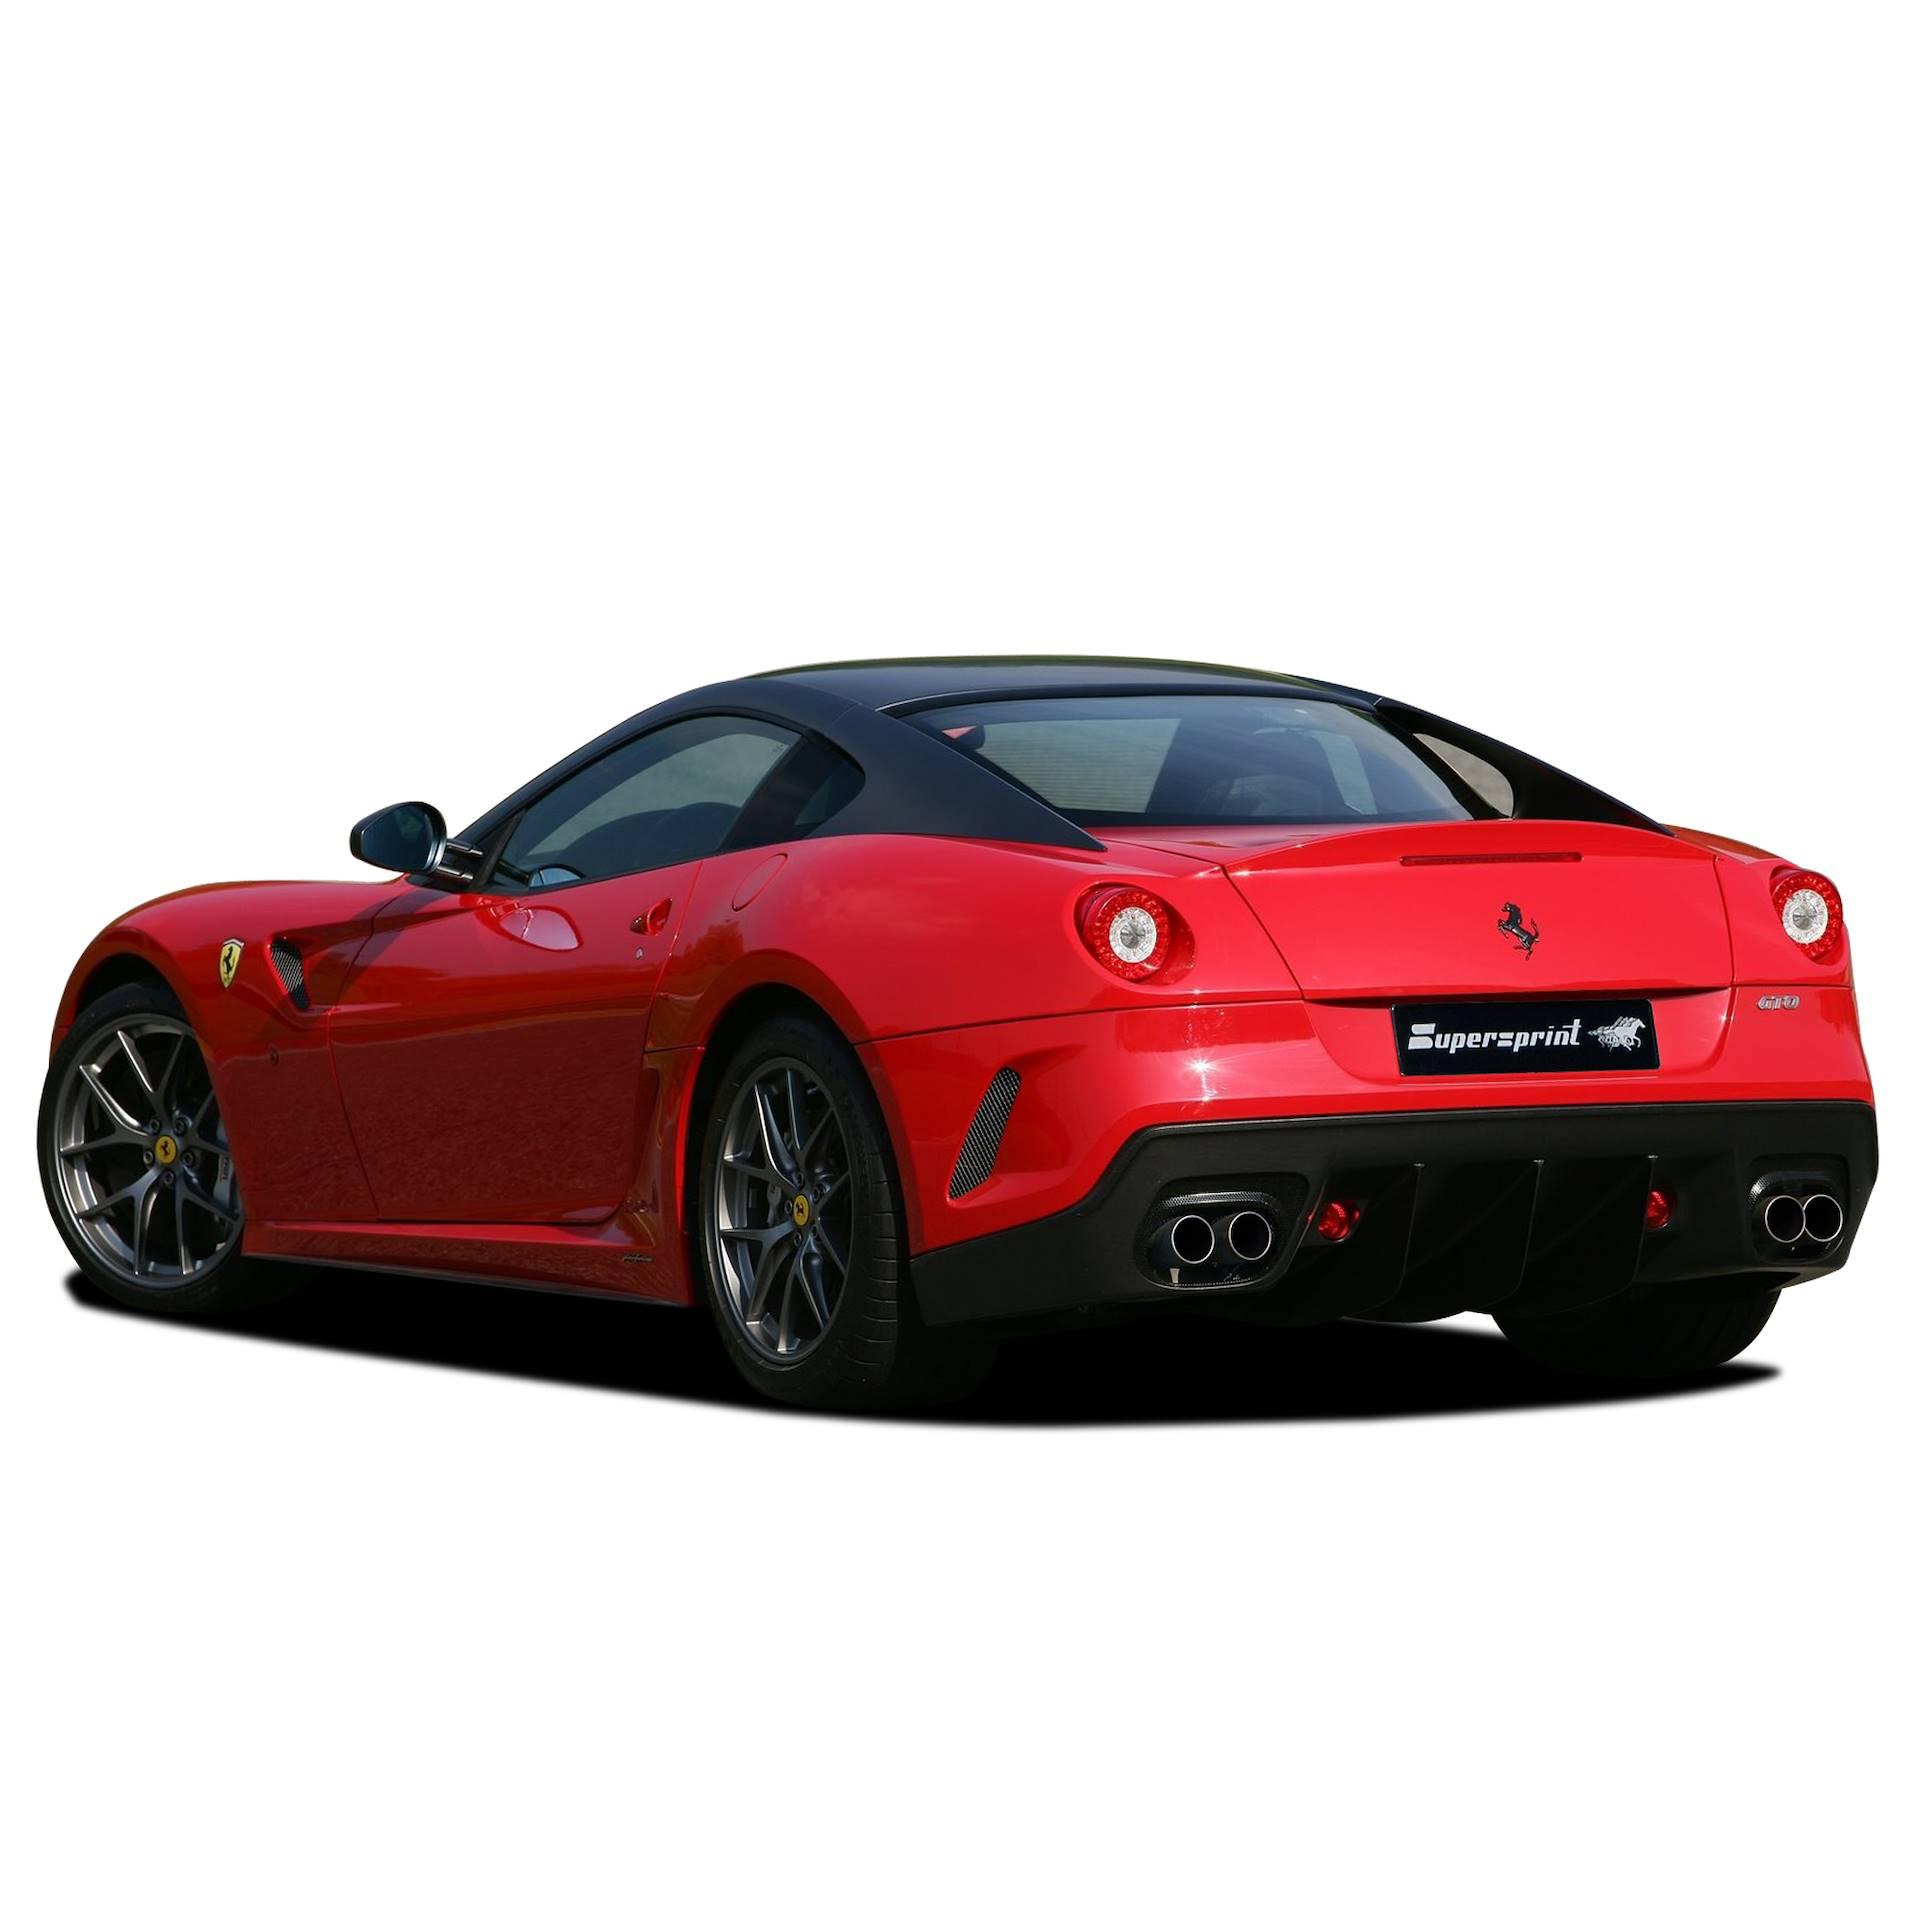 Sportauspuff Anlage Für FERRARI 599 GTO, FERRARI 599 GTO 6